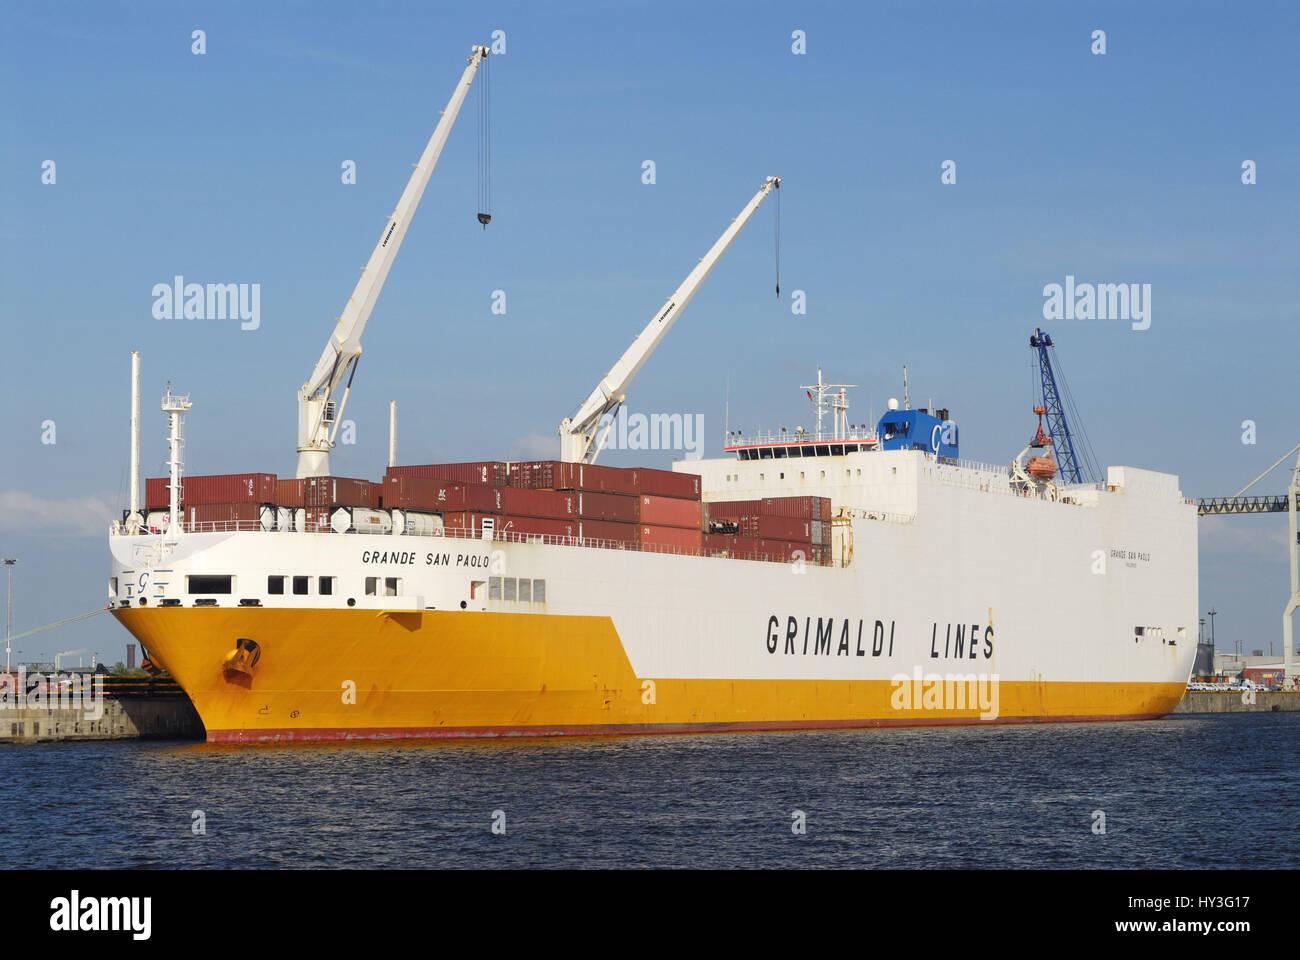 Grandee San Paolo of the Grimaldi Lines in the Hamburg harbour, Hamburg, Germany, Europe, Grande San Paolo der Grimaldi - Stock Image